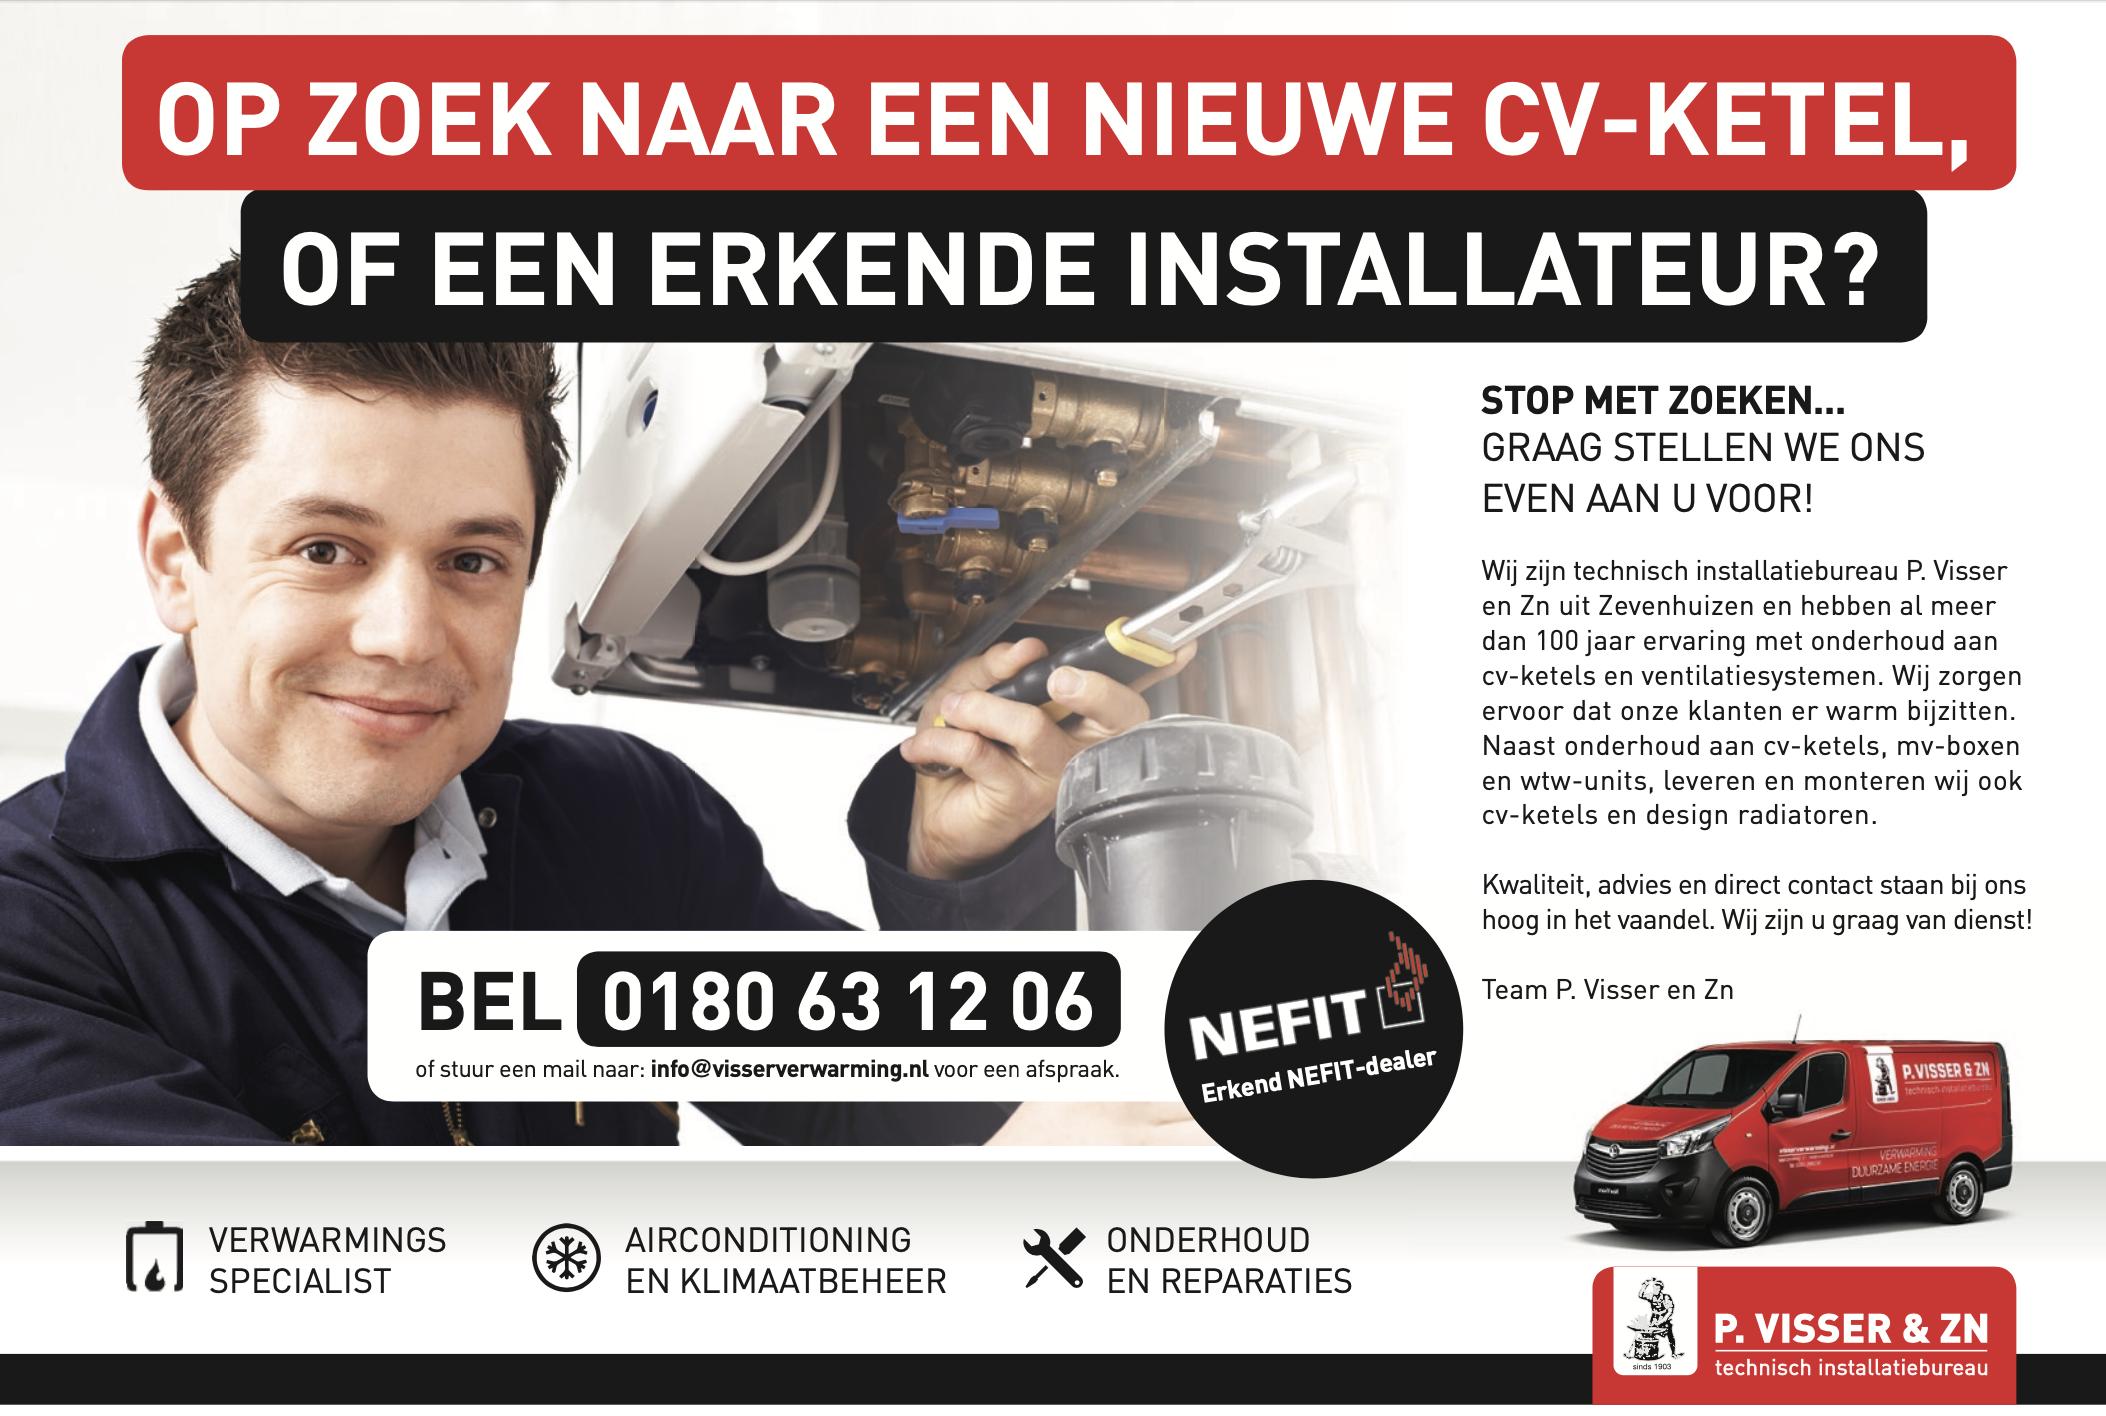 Sponsor uitgelicht: Technisch installatiebureau P. Visser en Zn